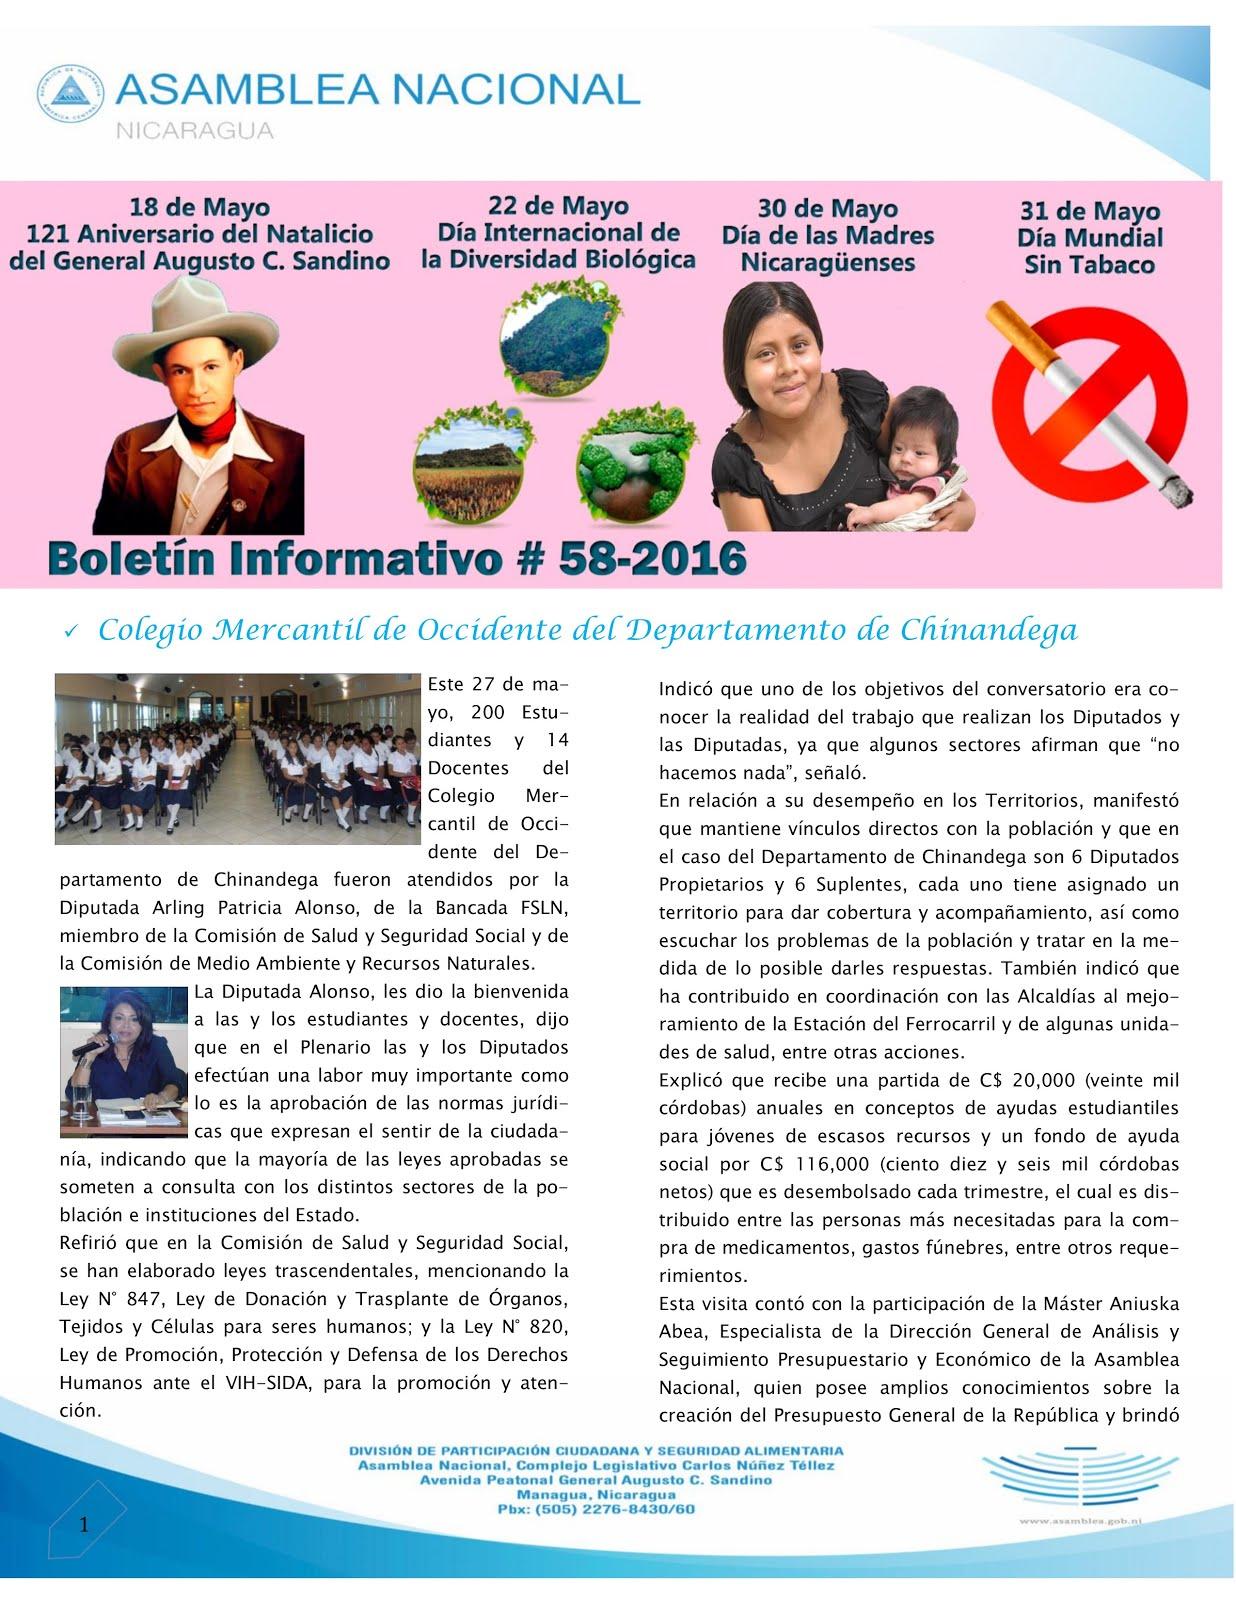 CMO visita Asamblea Nacional_2016